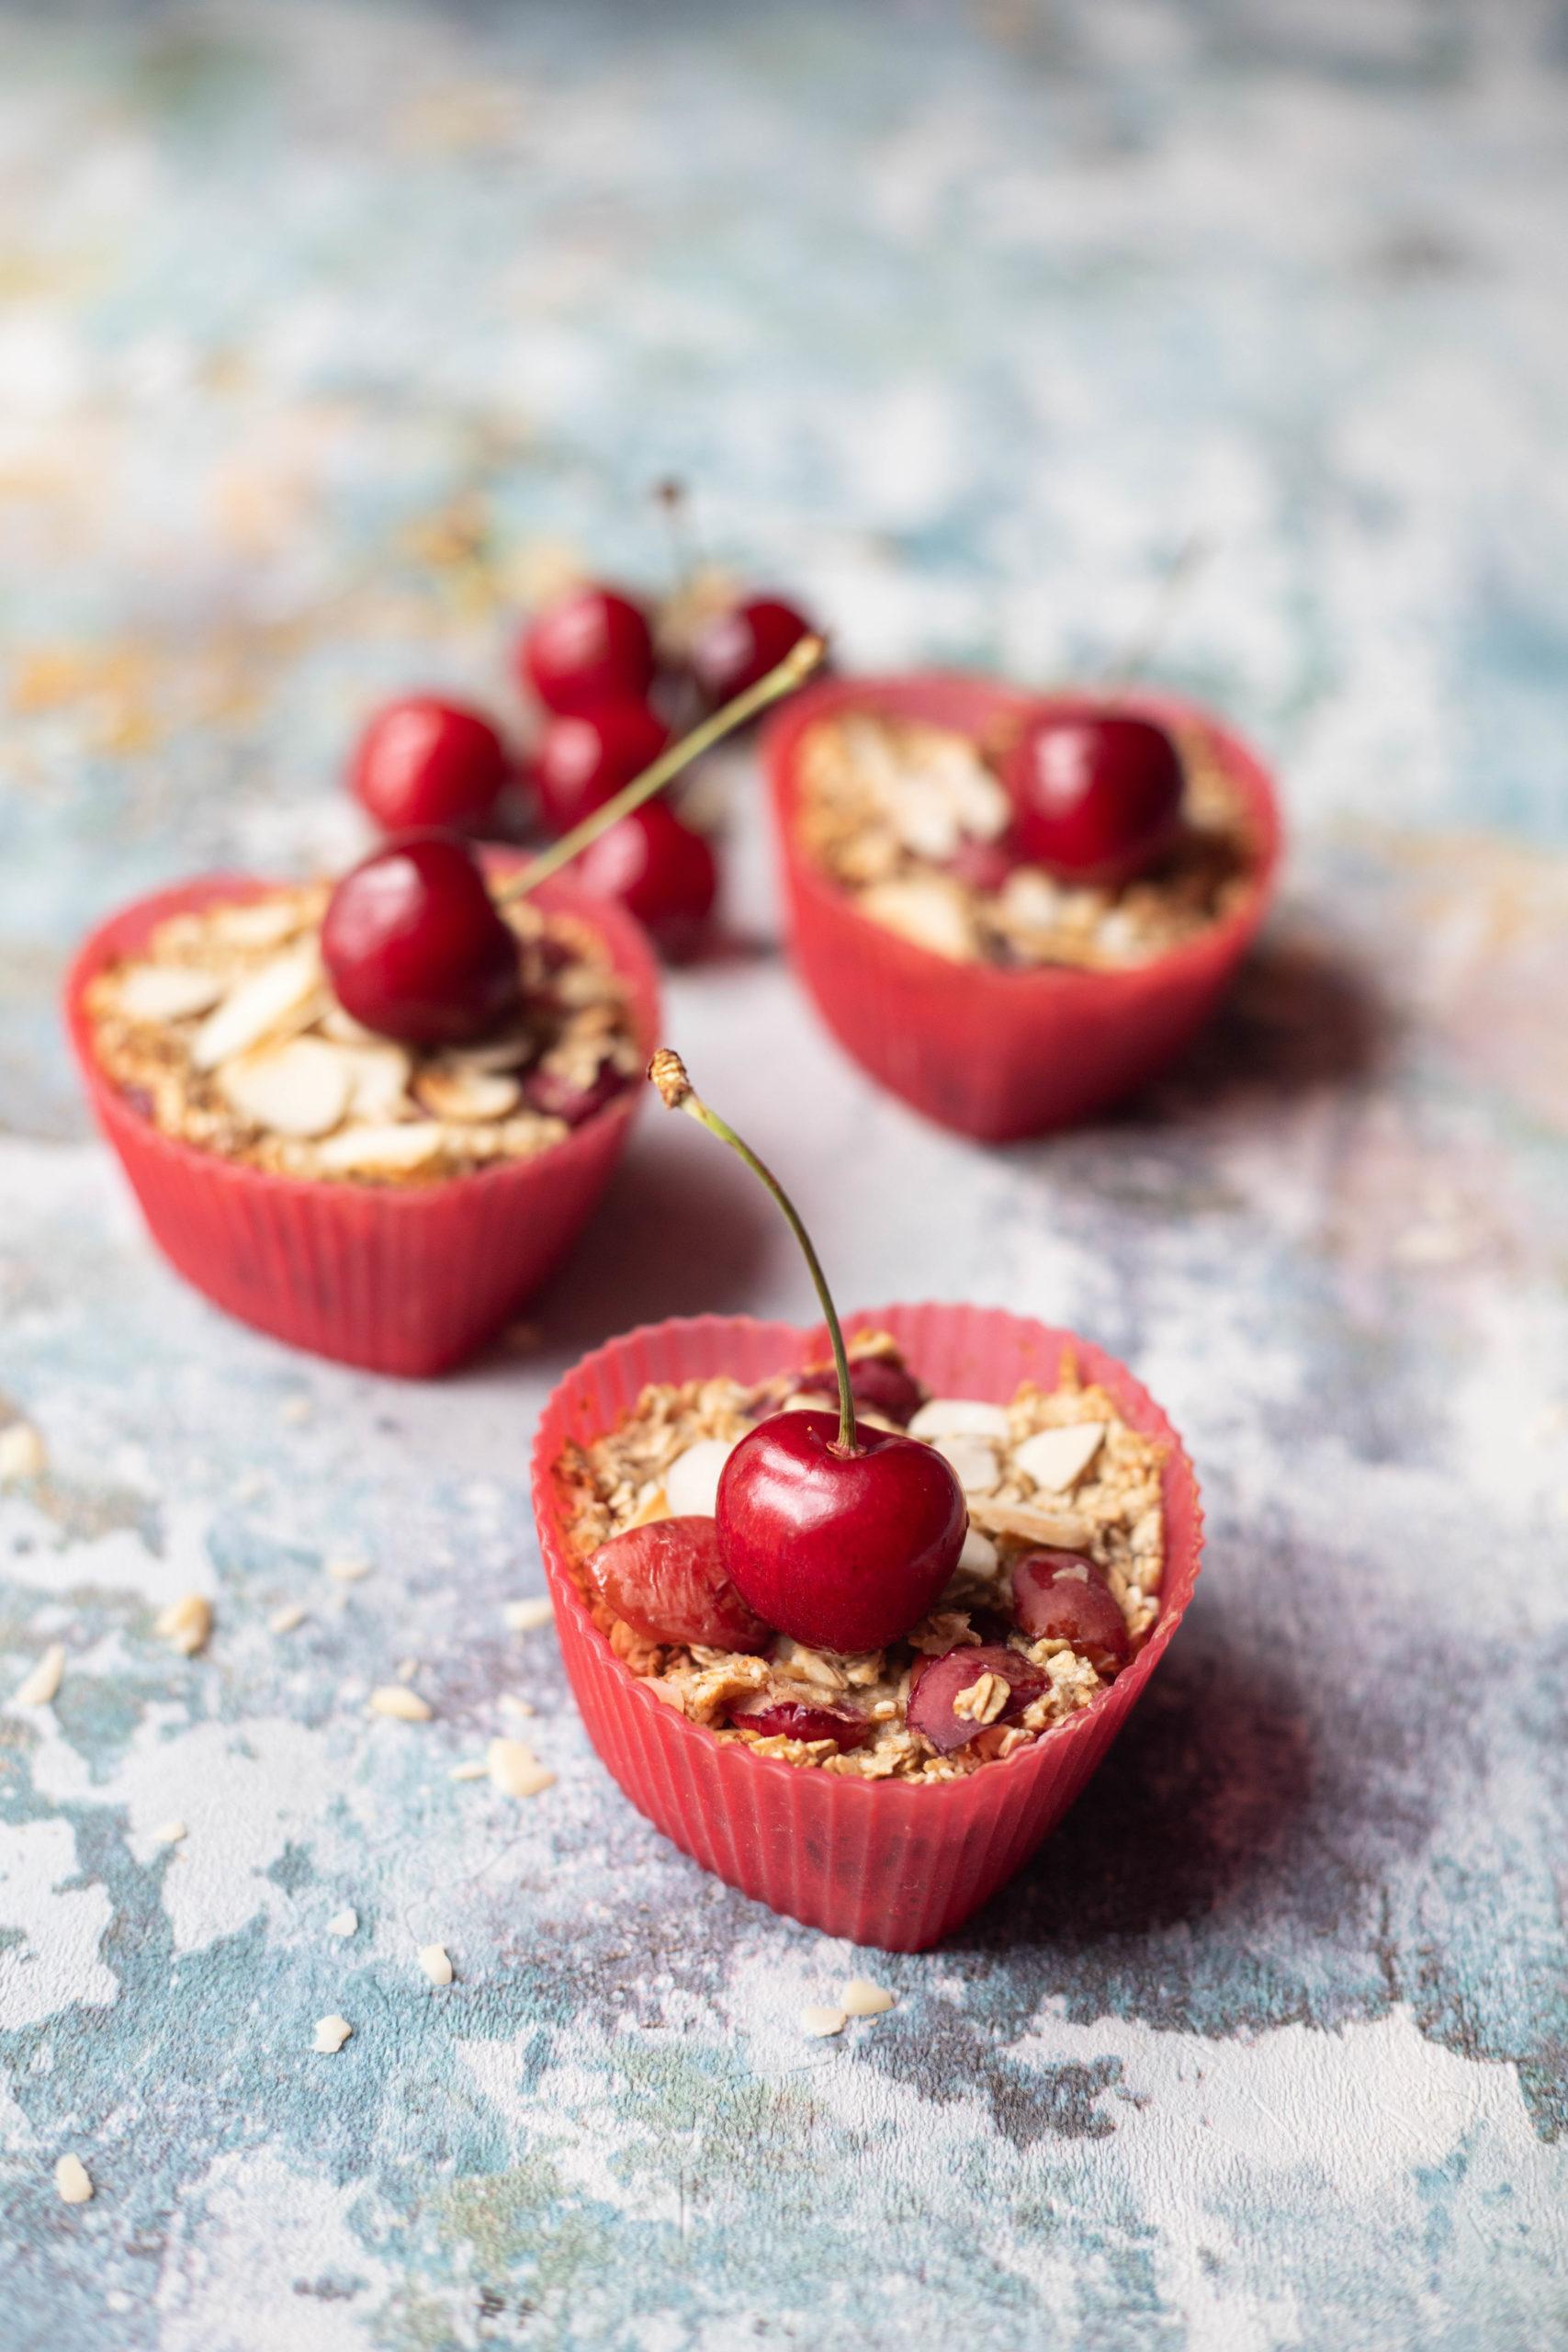 Cherry Bakewell Oats Muffins